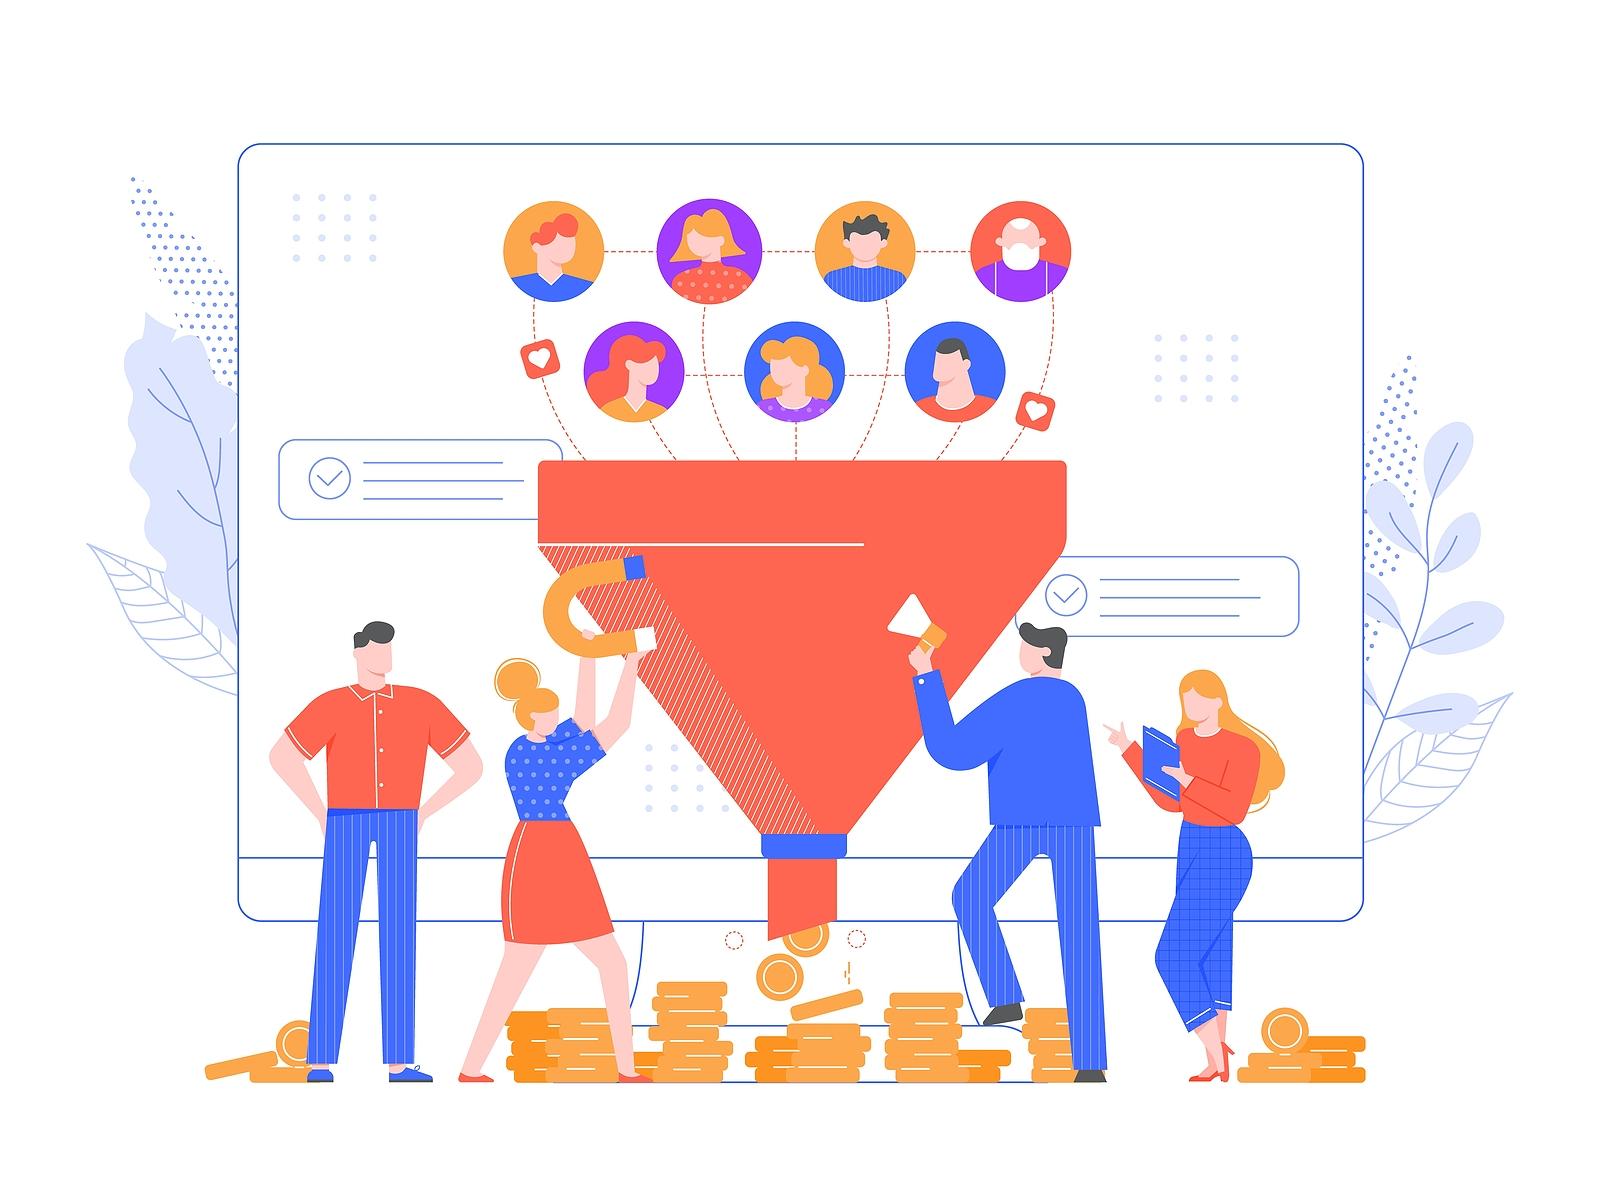 sales funnel and digital marketing lead generation